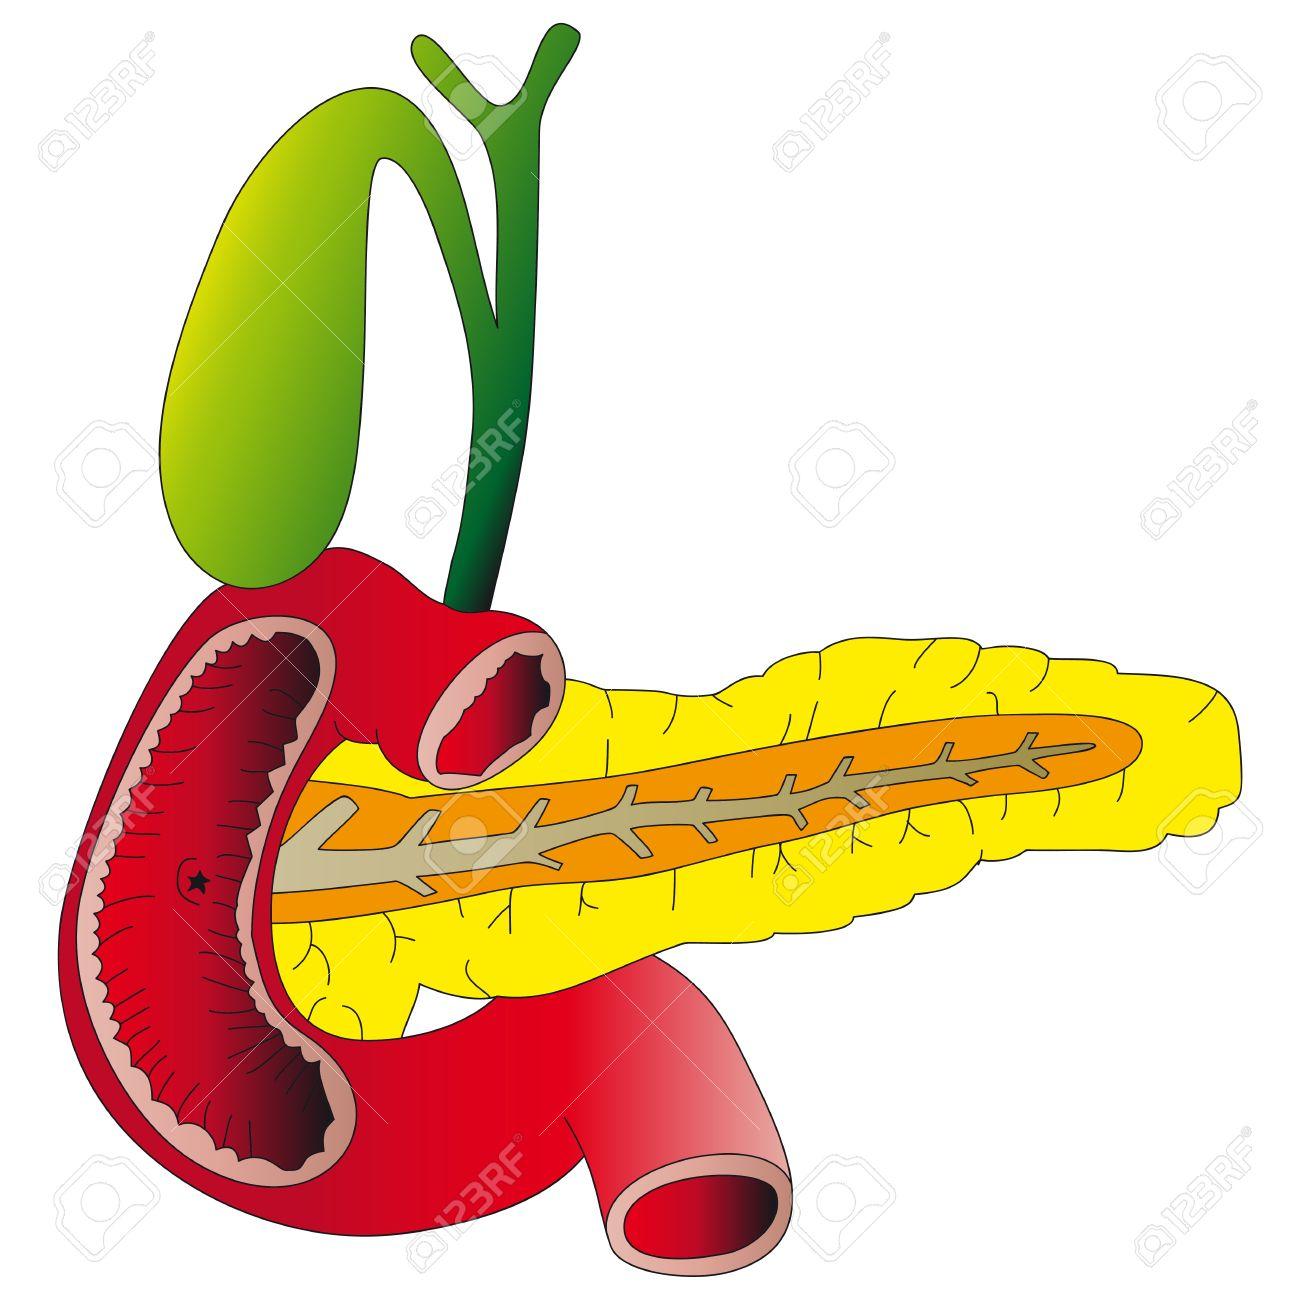 Human digestive organs  the pancreas, gallbladder, duodenum Stock Vector - 16438911